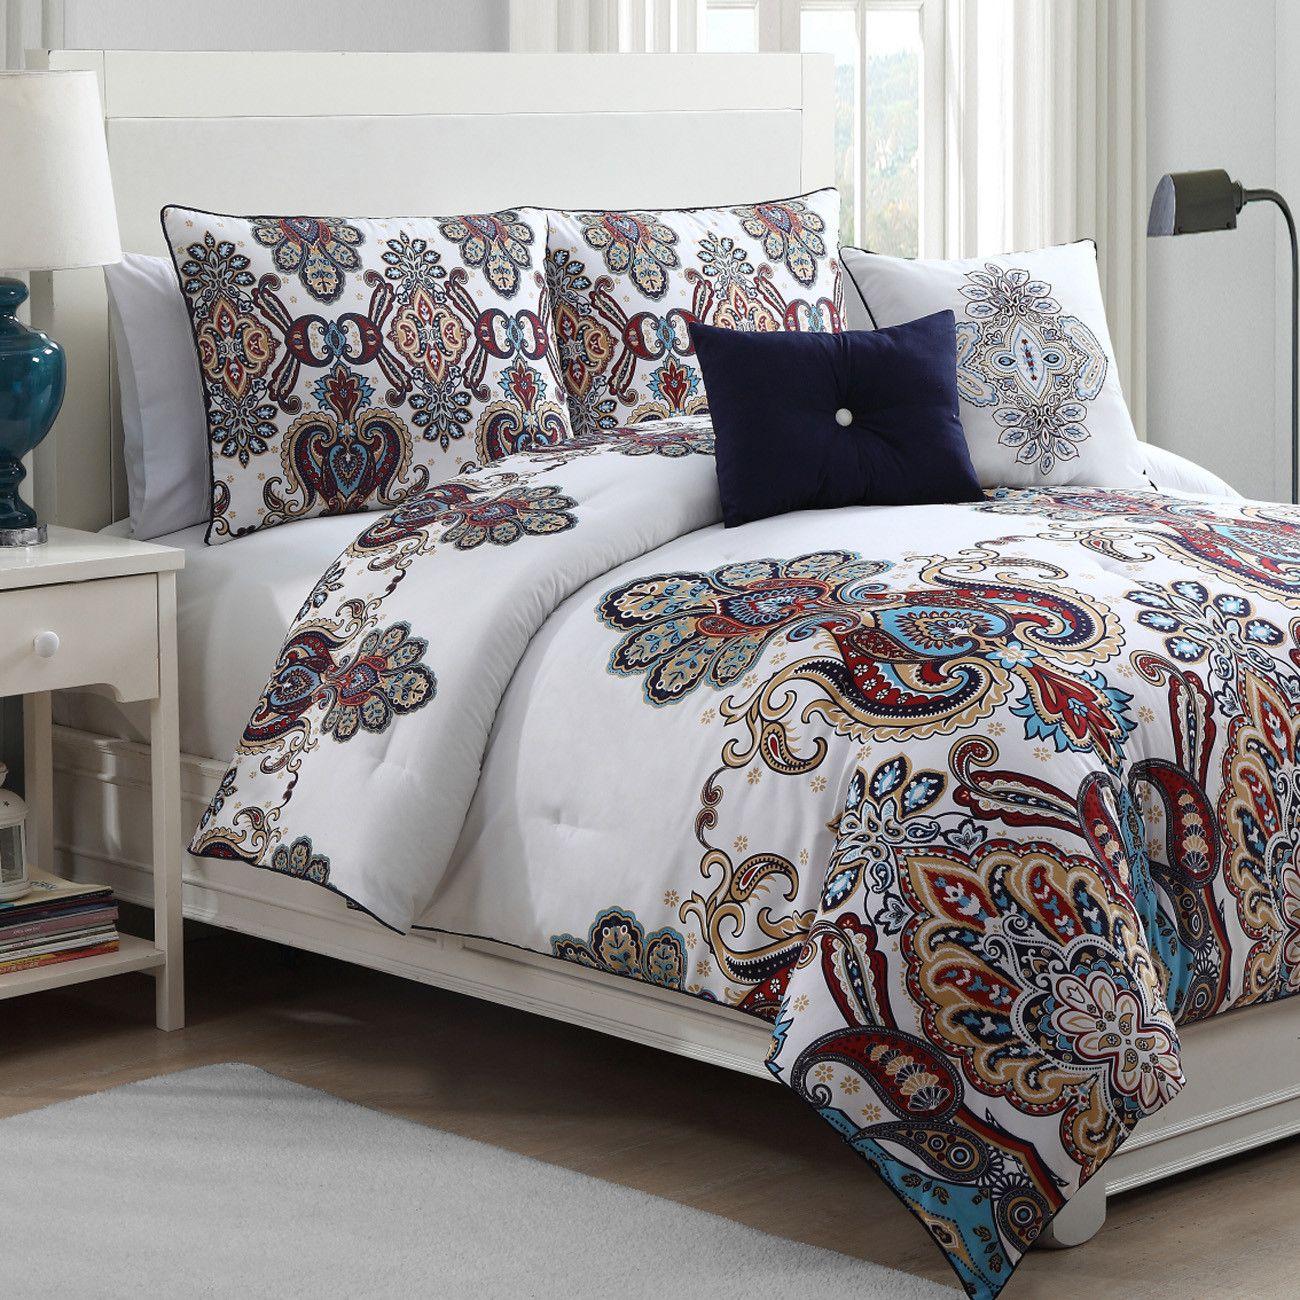 Joss and Main Comforter sets, Bedding sets, Patterned